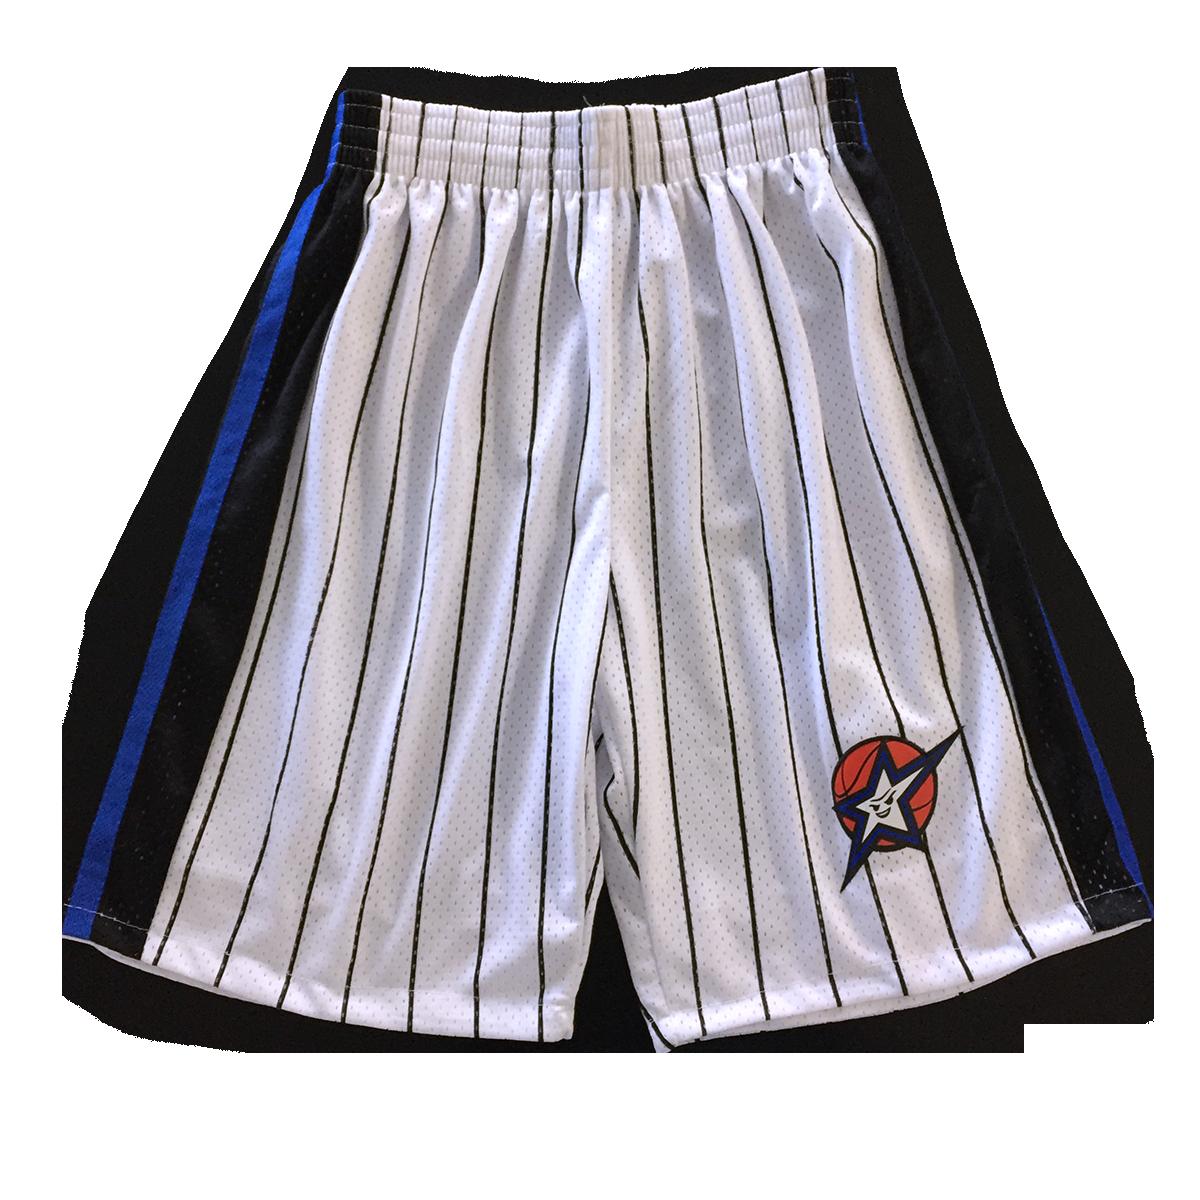 Orlando Trapstars Shorts